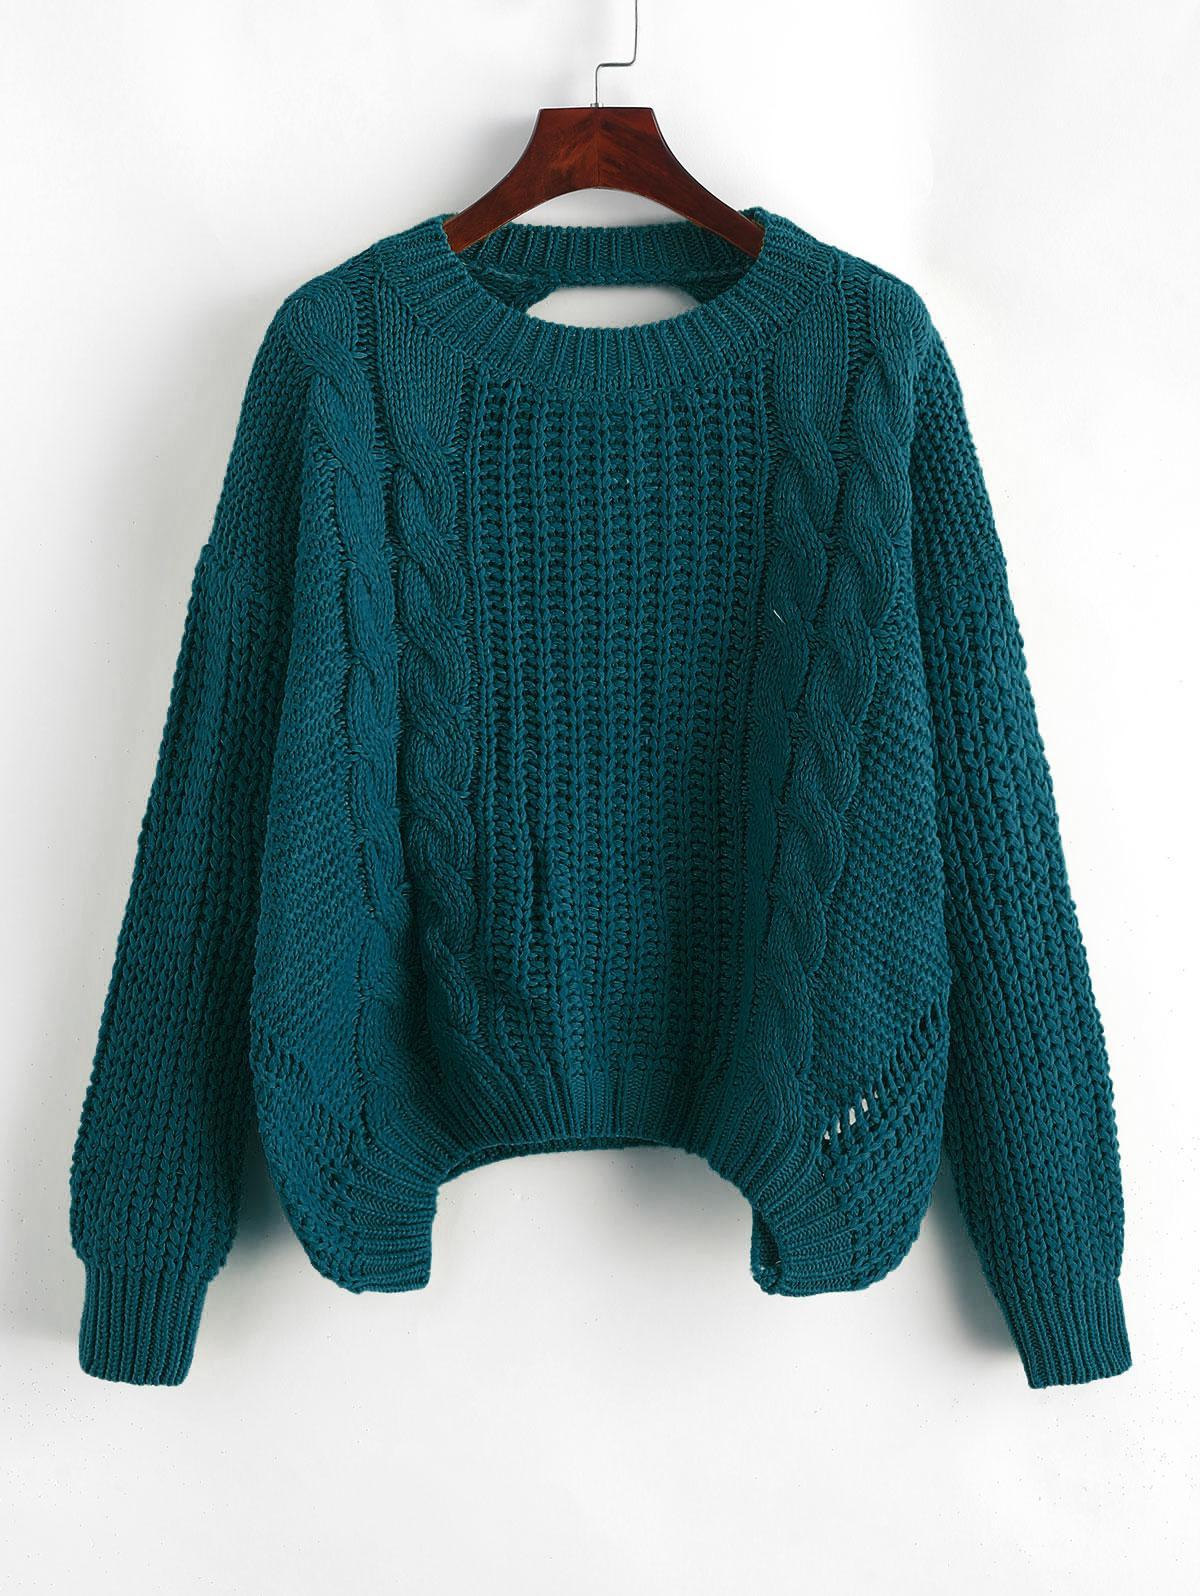 Drop Shoulder Cable Knit Cut Out Back Sweater